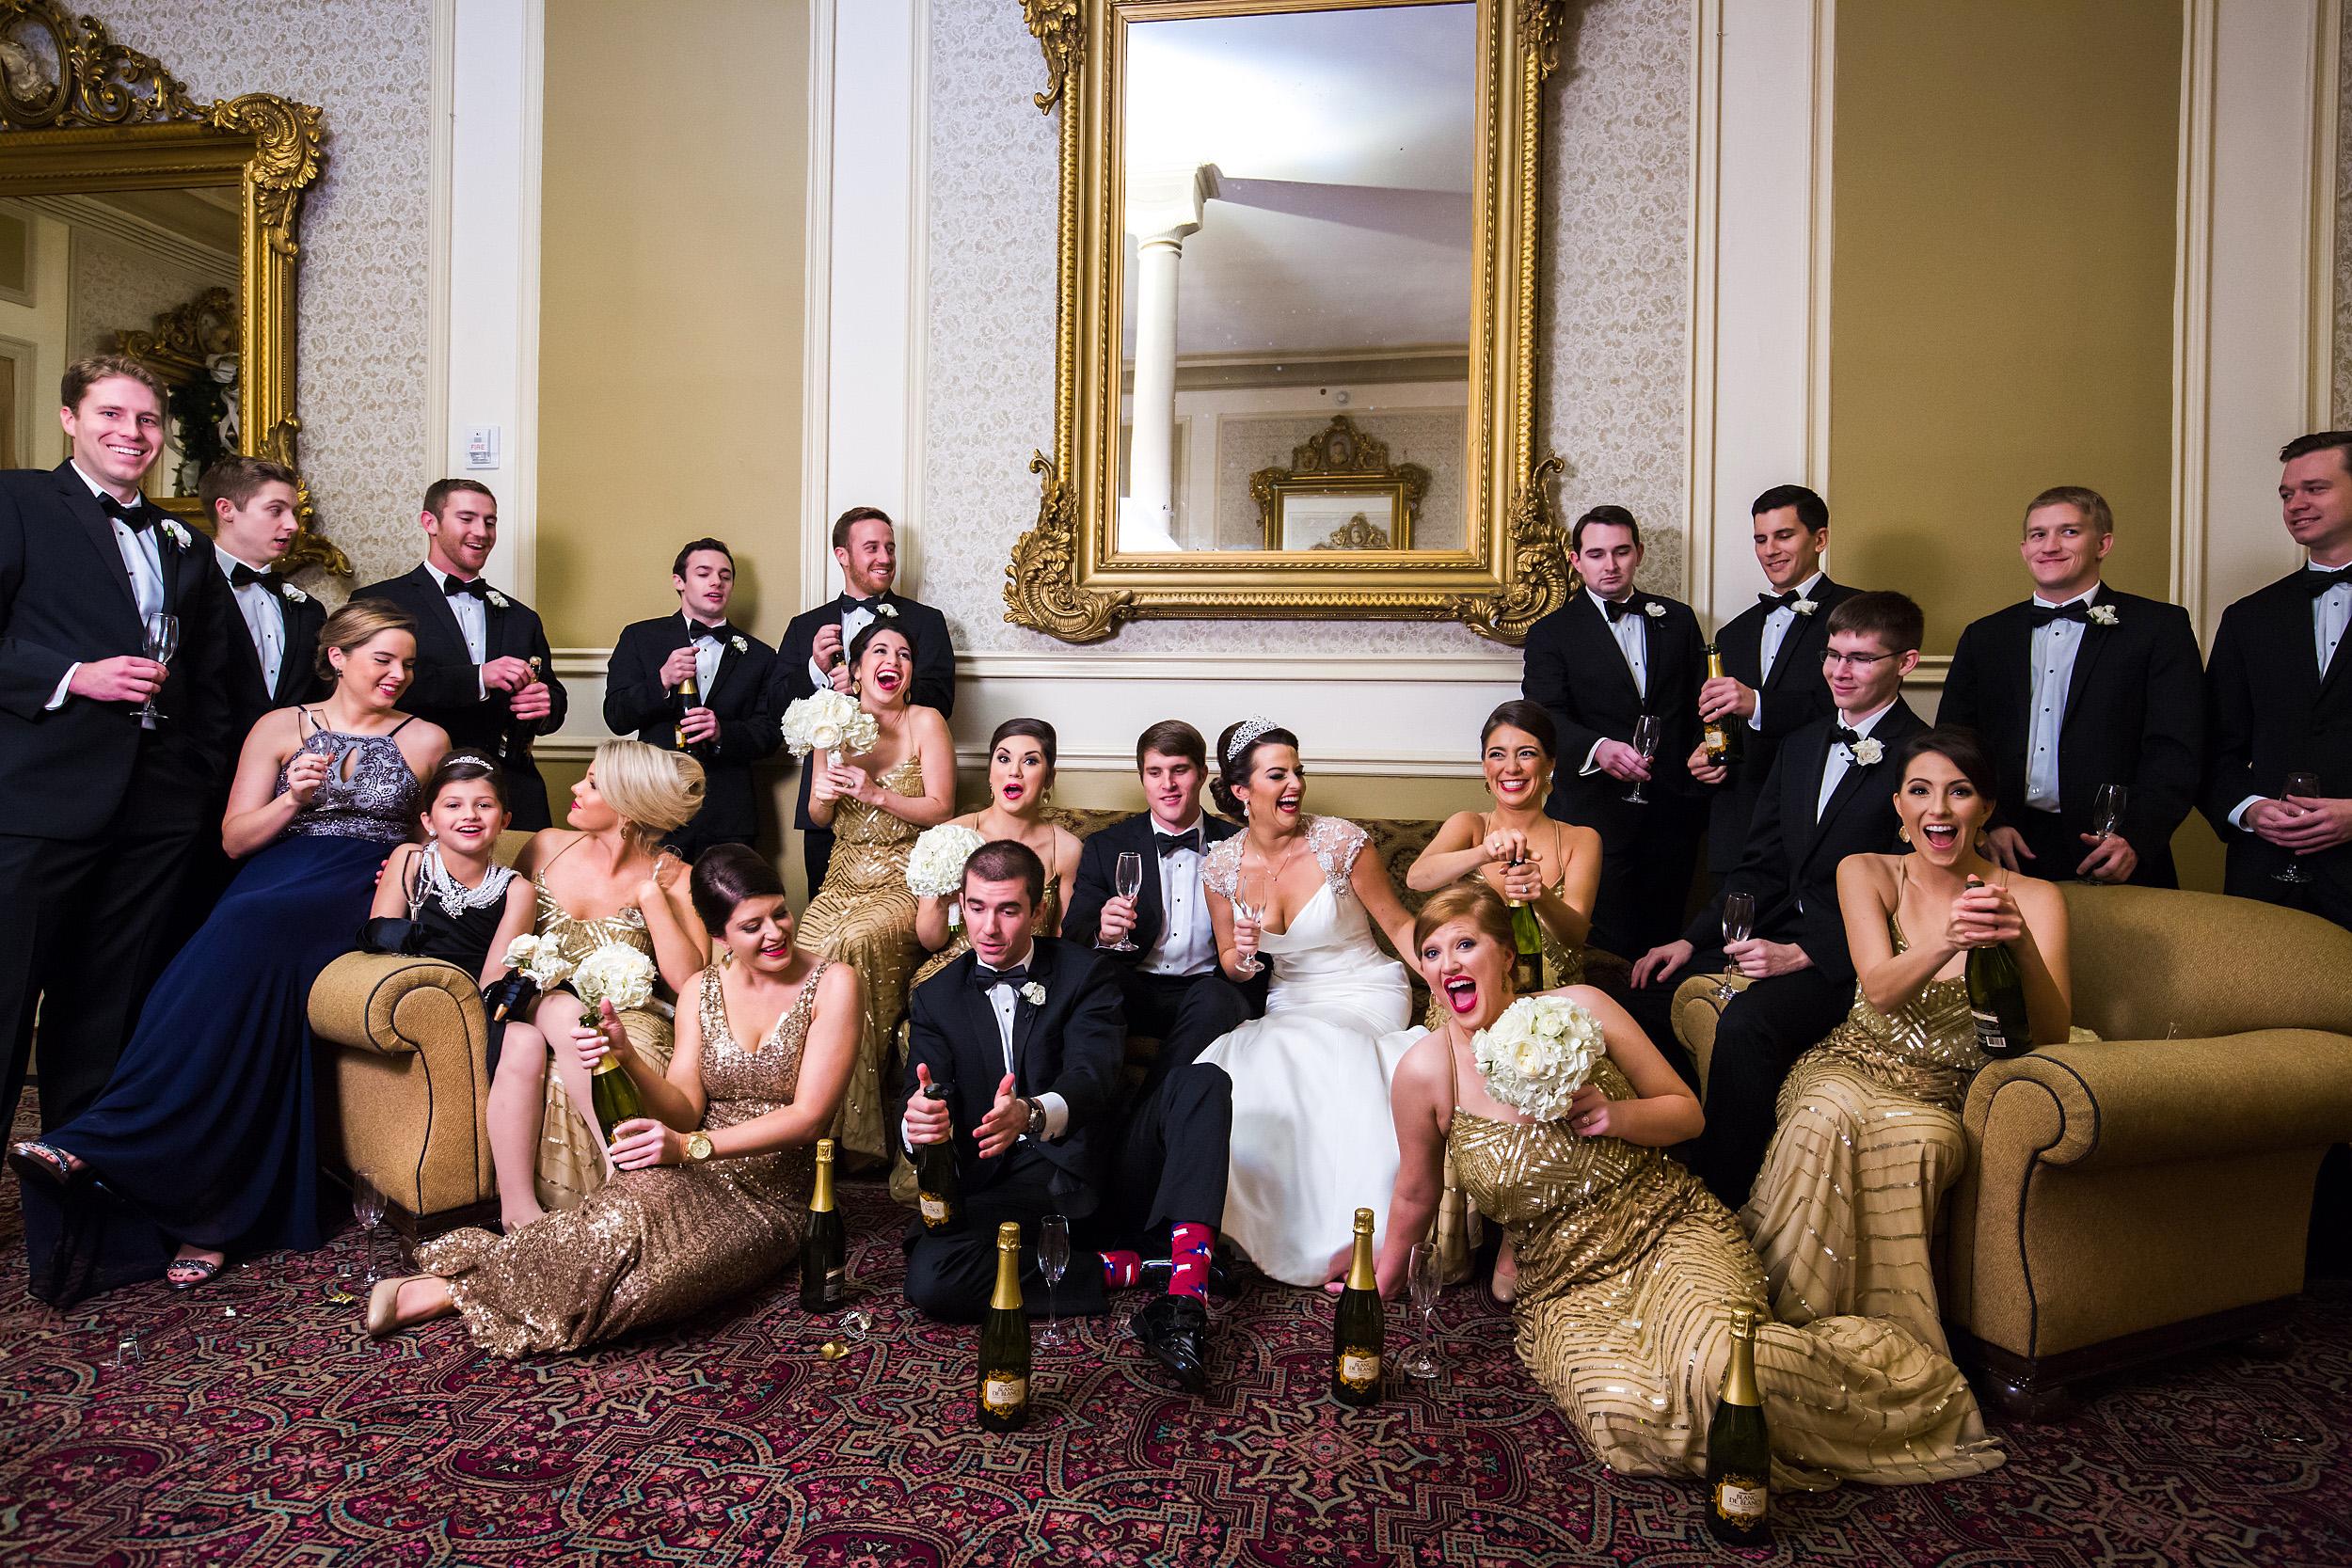 austin-wedding-mike-reed-17.jpg